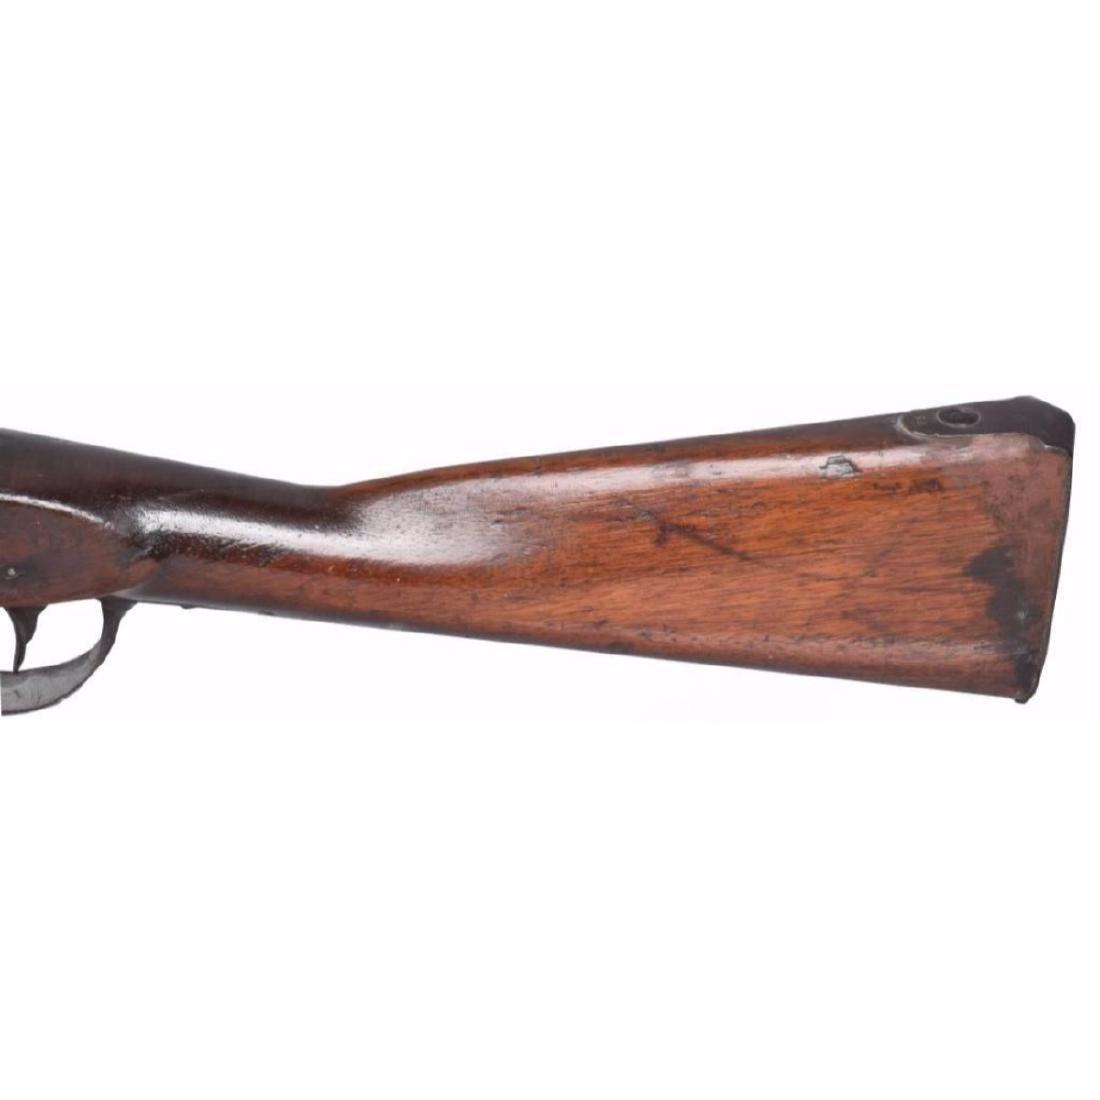 Rare U.S. 1816 HARPERS FERRY .69 caliber MUSKET - 3